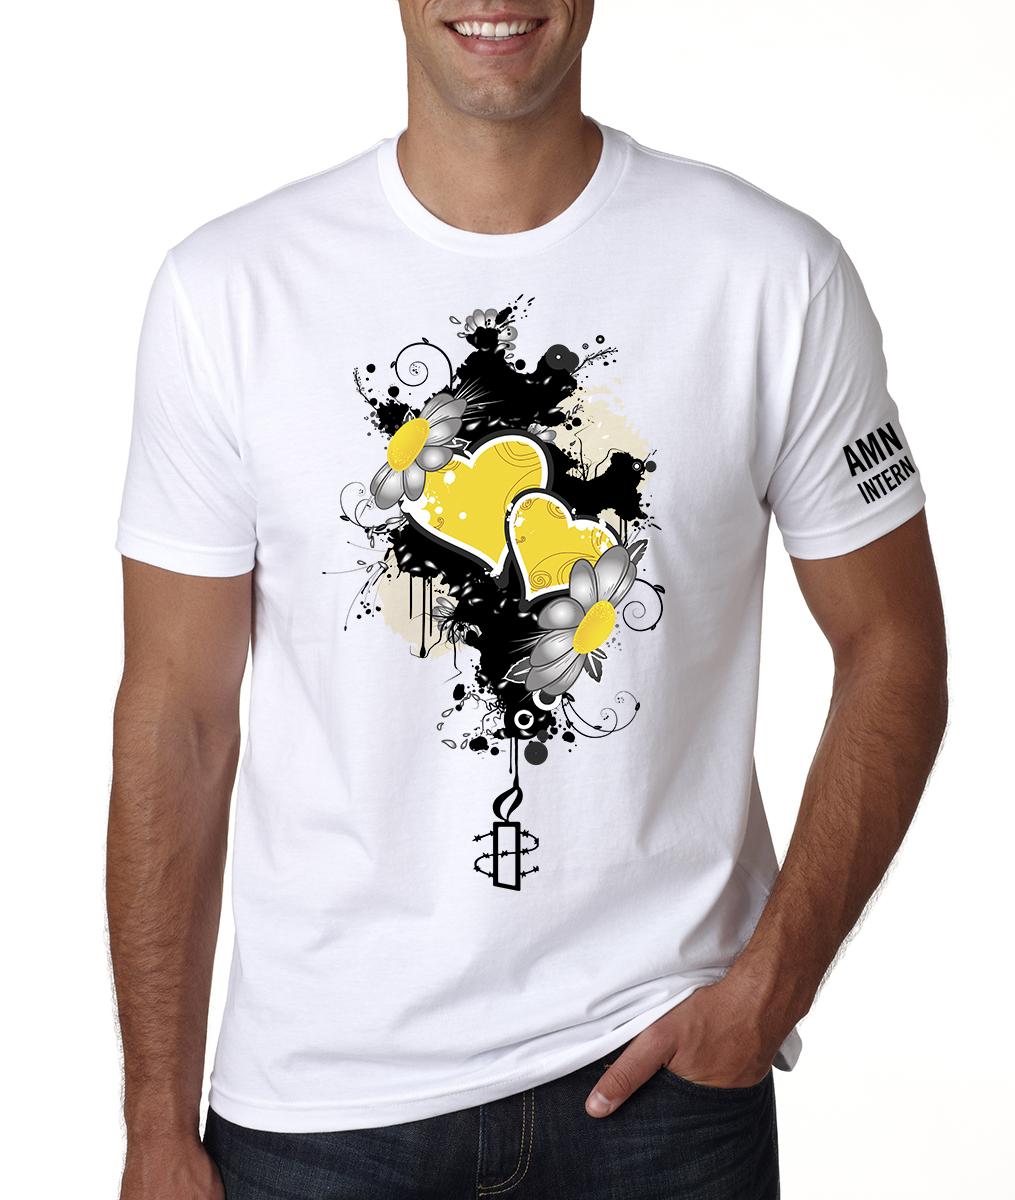 T shirt design for amnesty international australia by Design t shirt australia